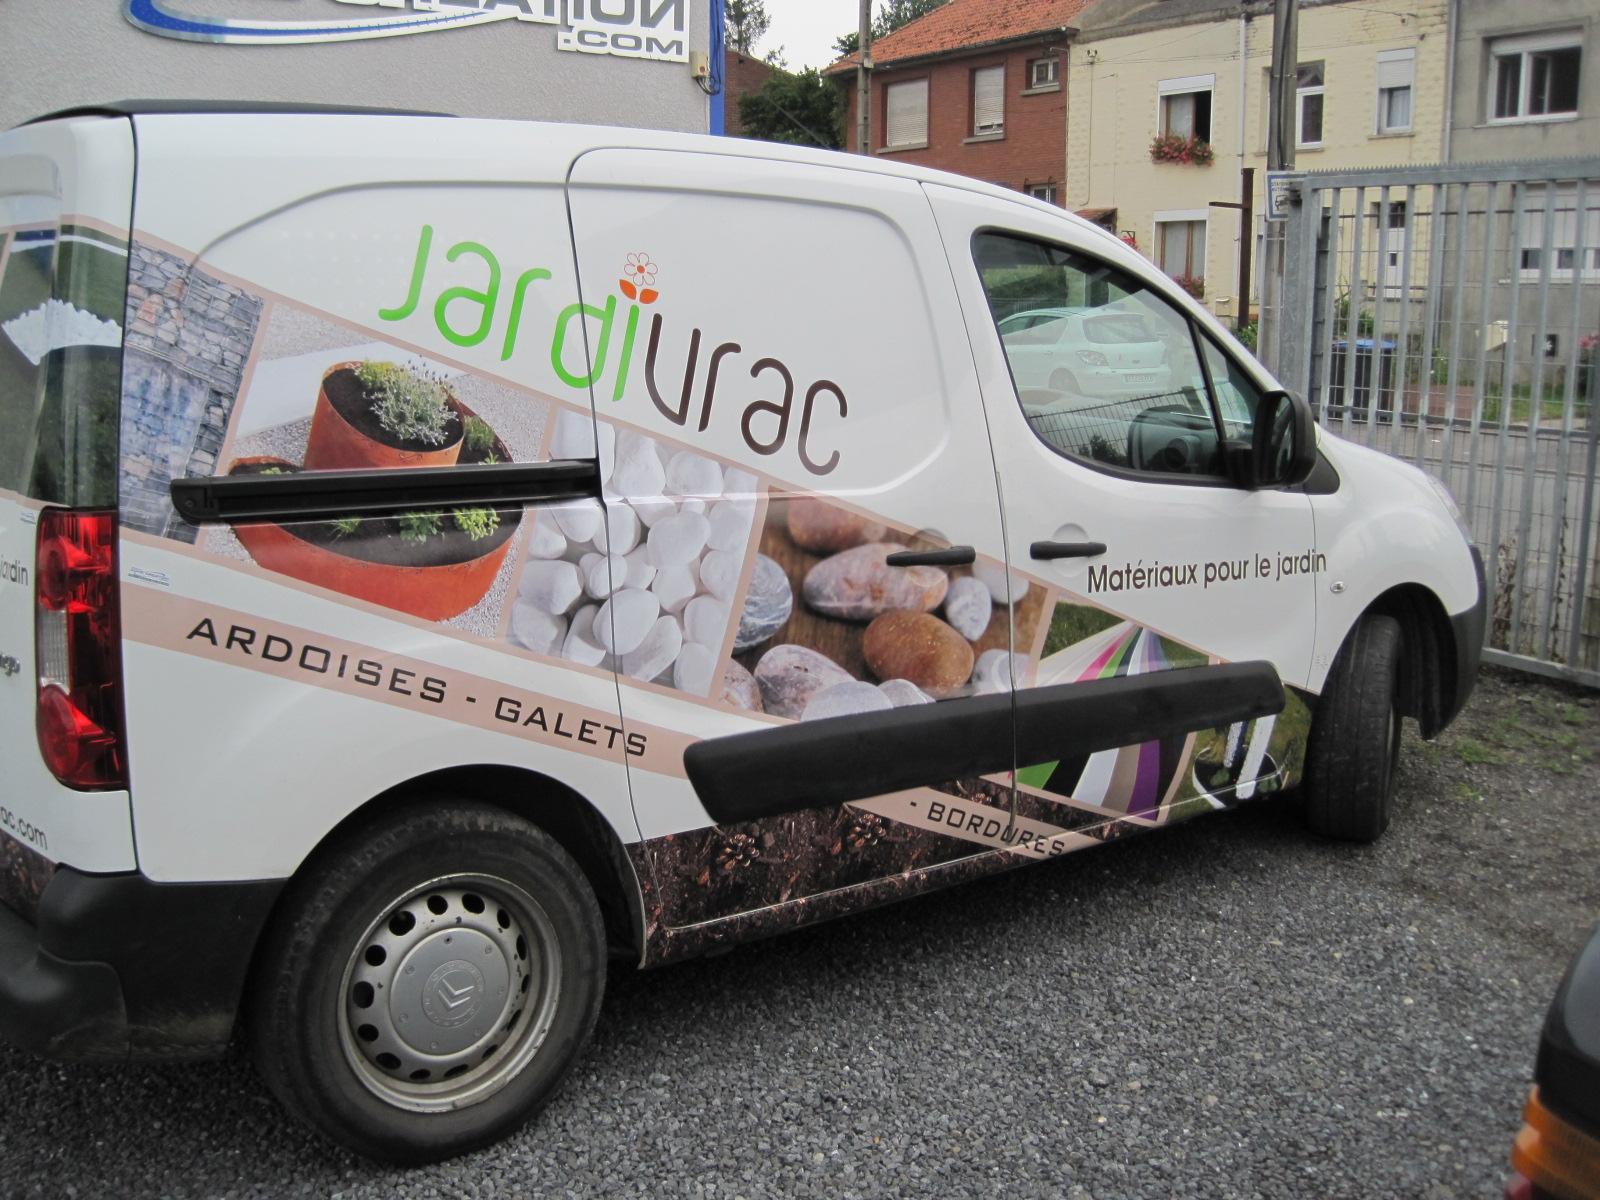 JardiVrac